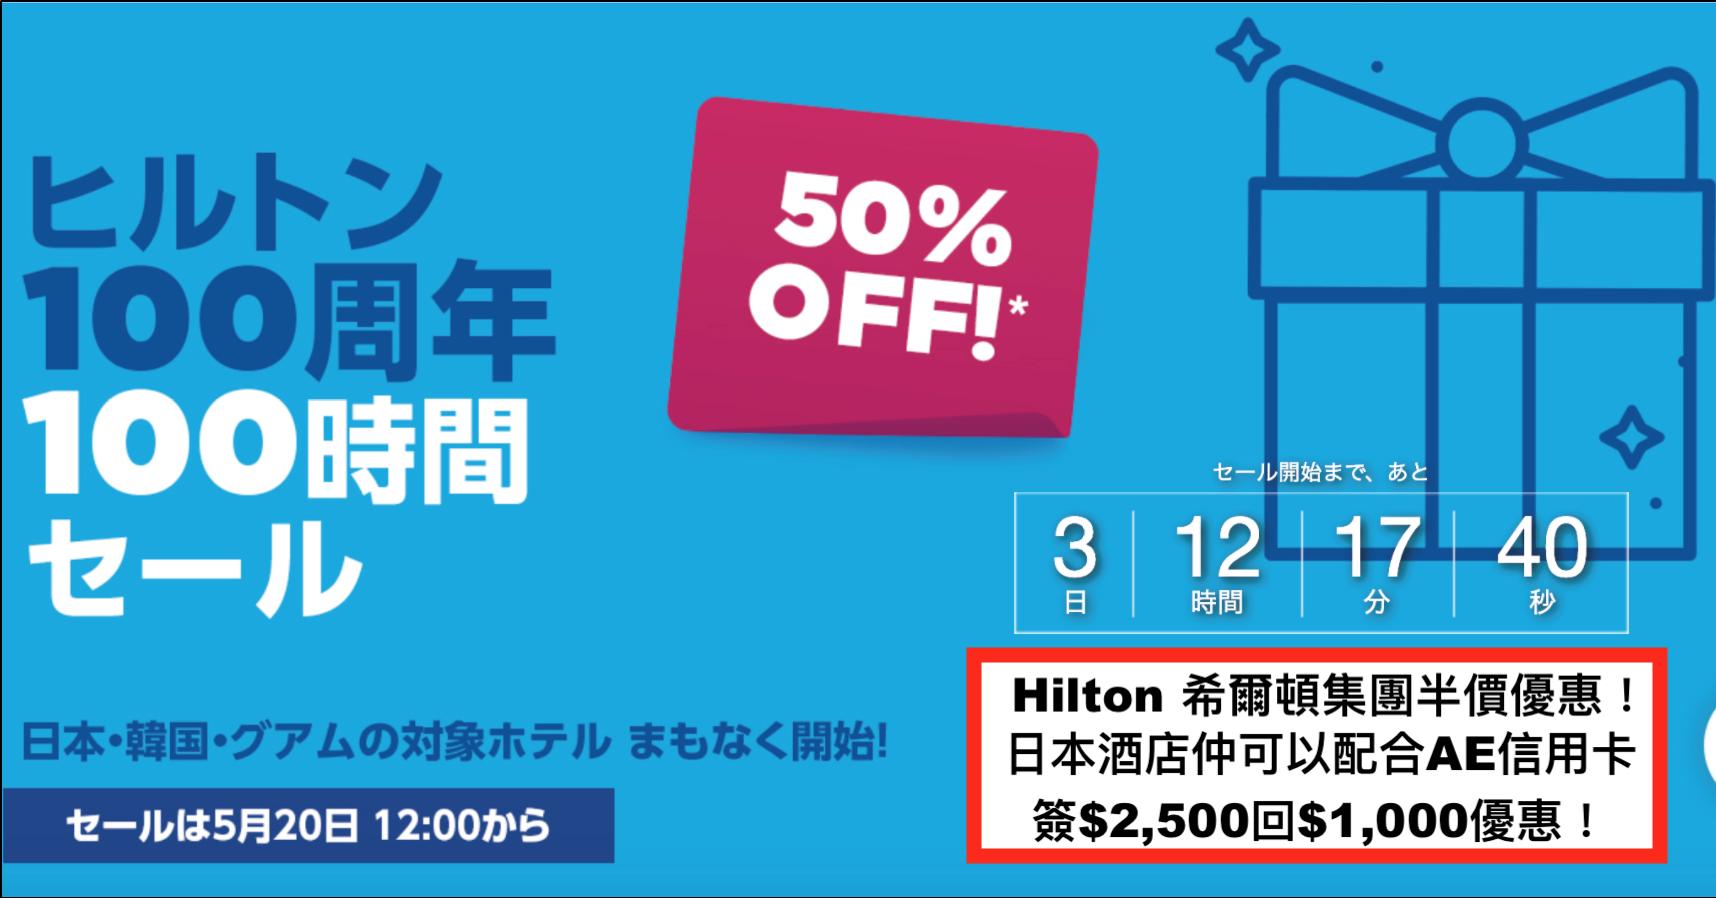 Hilton希爾頓集團半價優惠!日 / 韓 / 關島 低至$600連稅一晚酒店!日本酒店仲可以配合AE信用卡簽$2,500回$1,000優惠!